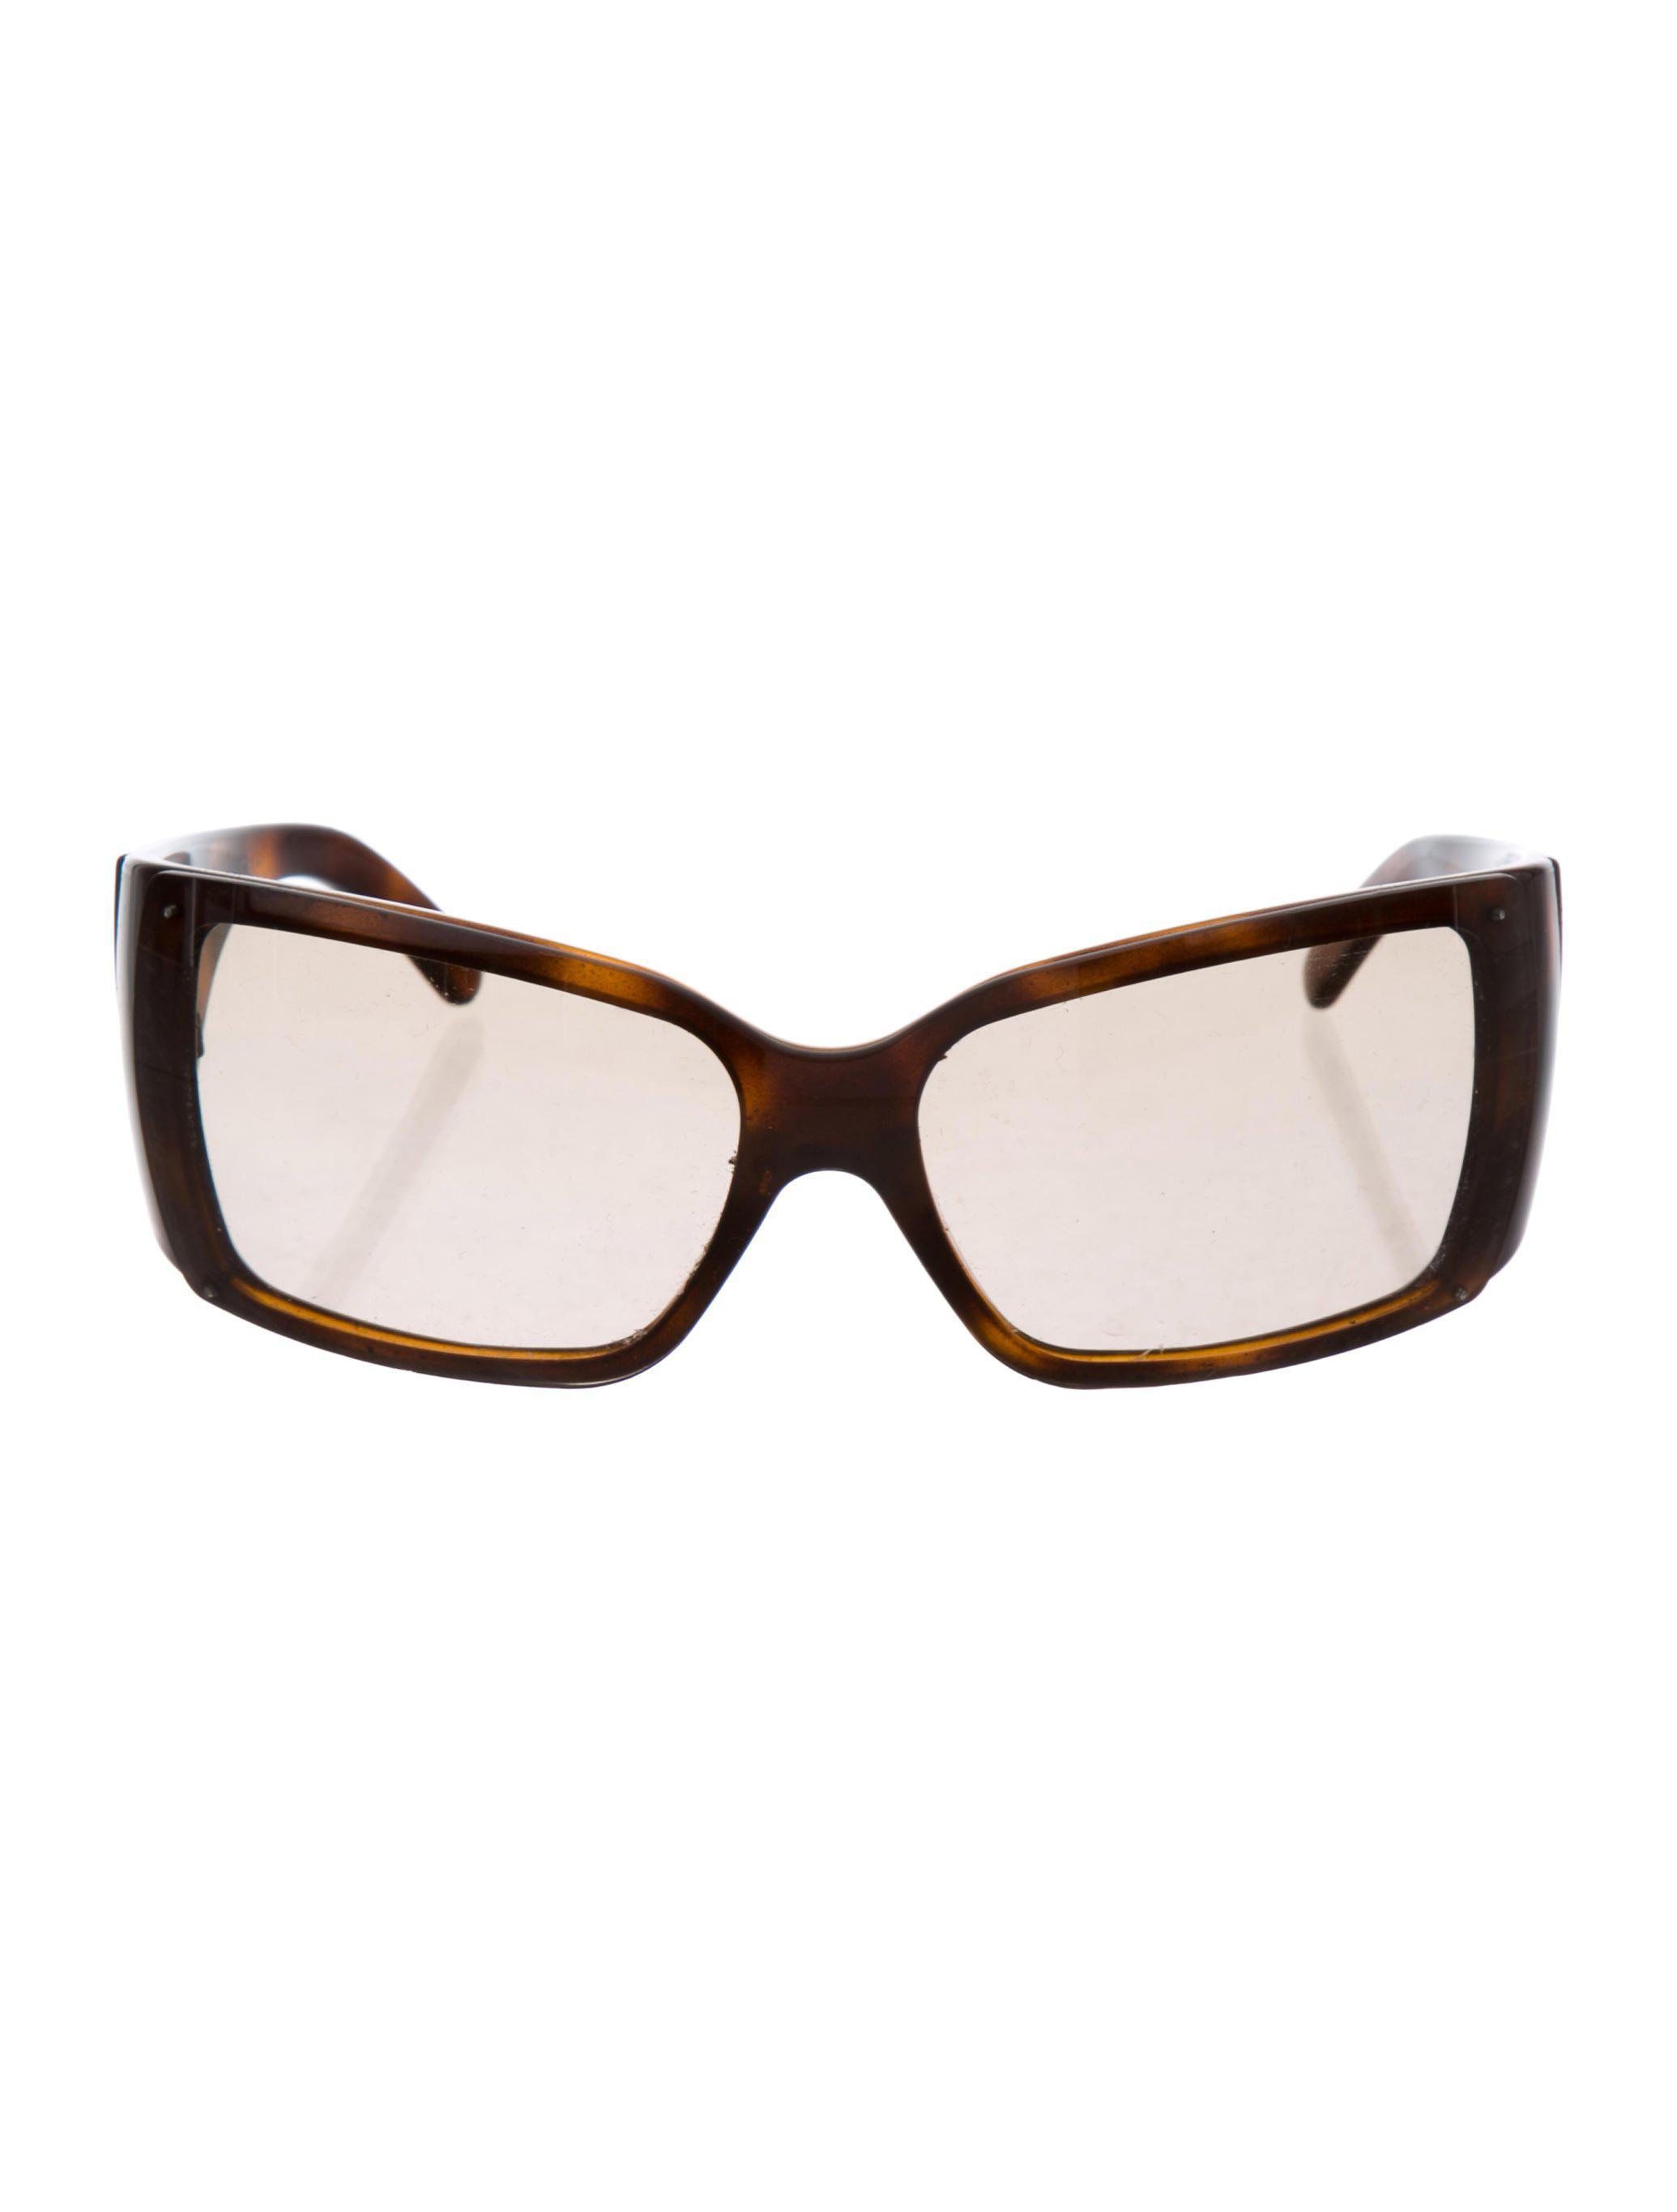 a00ecd474e Lyst - Chanel Shield Tinted Sunglasses Brown in Metallic